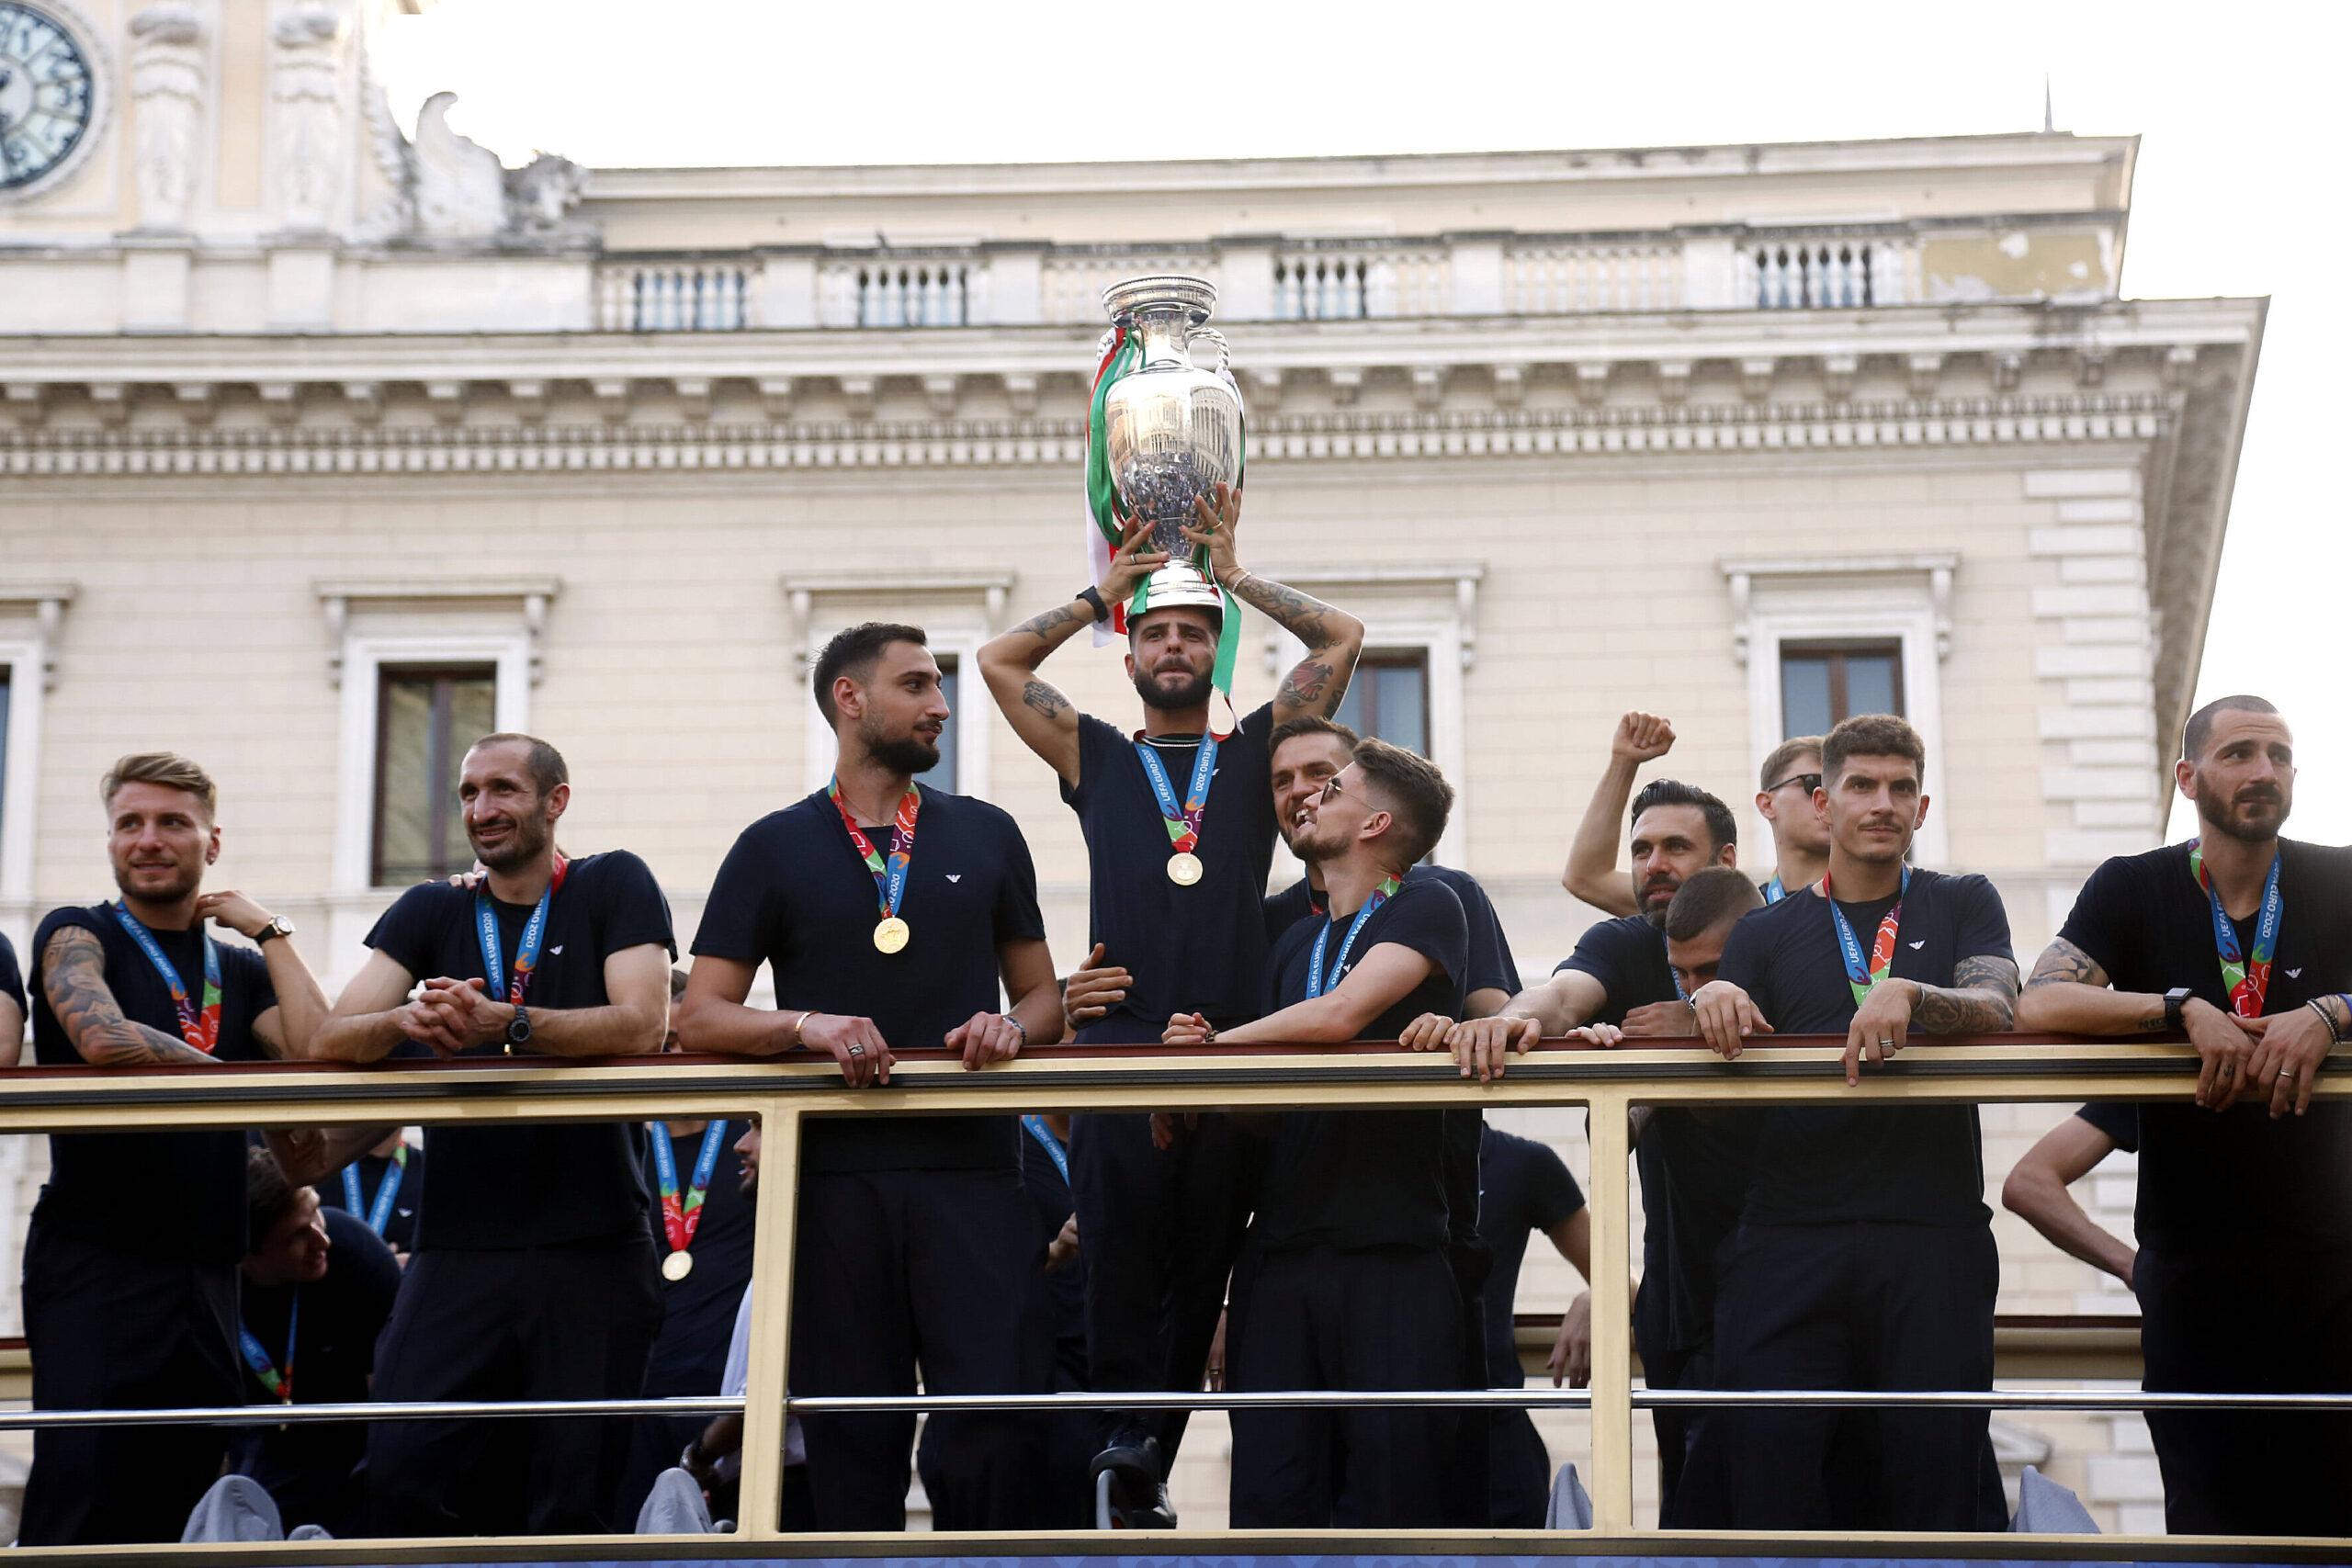 top 11 di Euro 2020